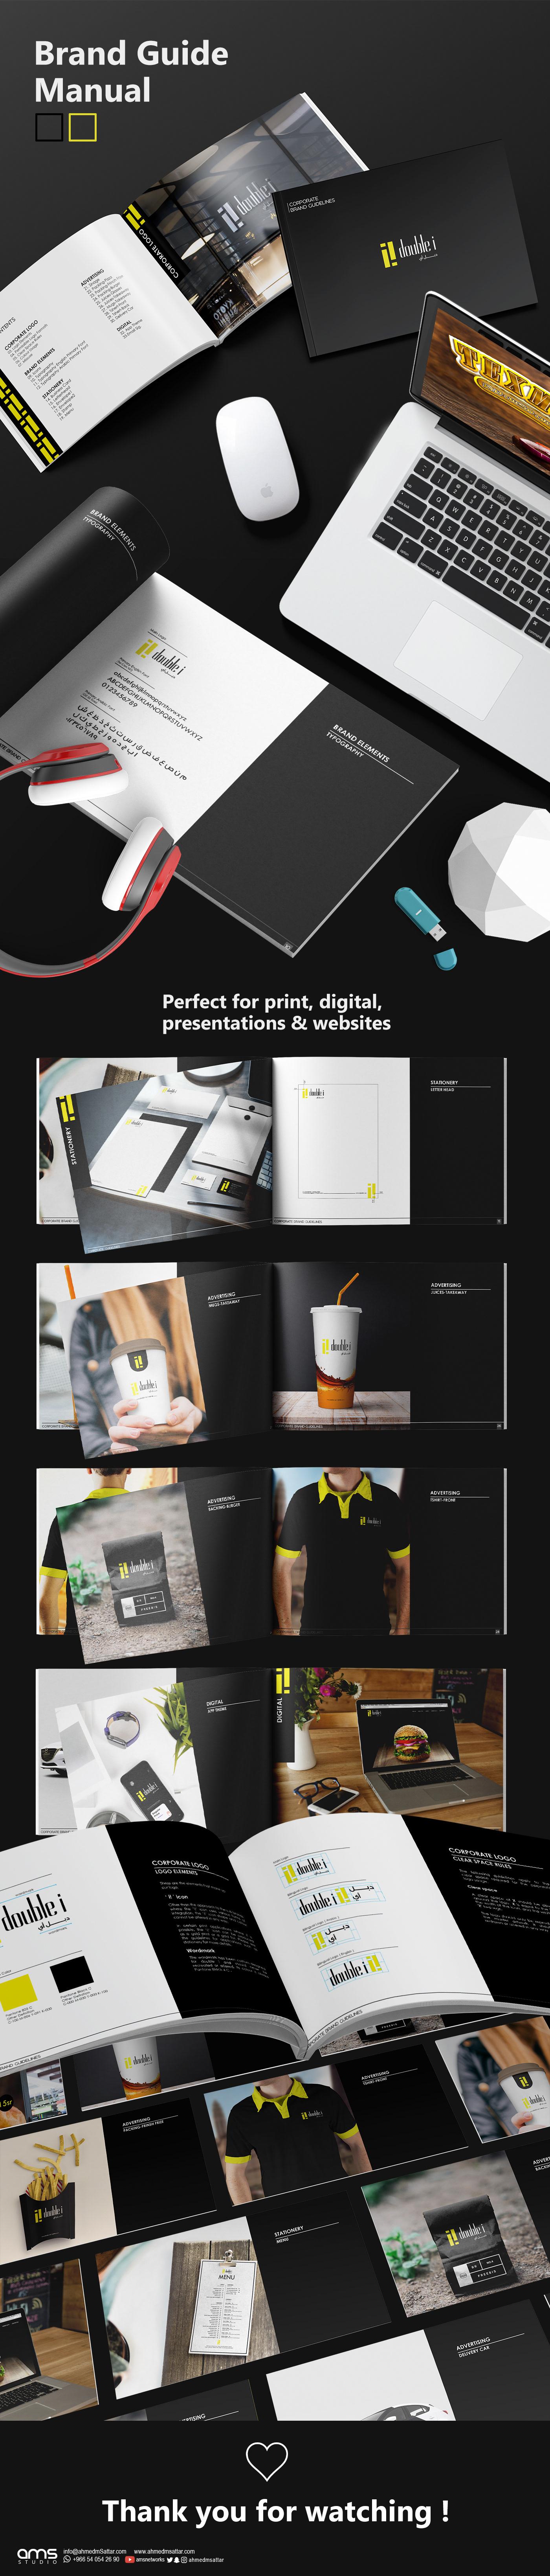 brand branding  design Guide manual resturant